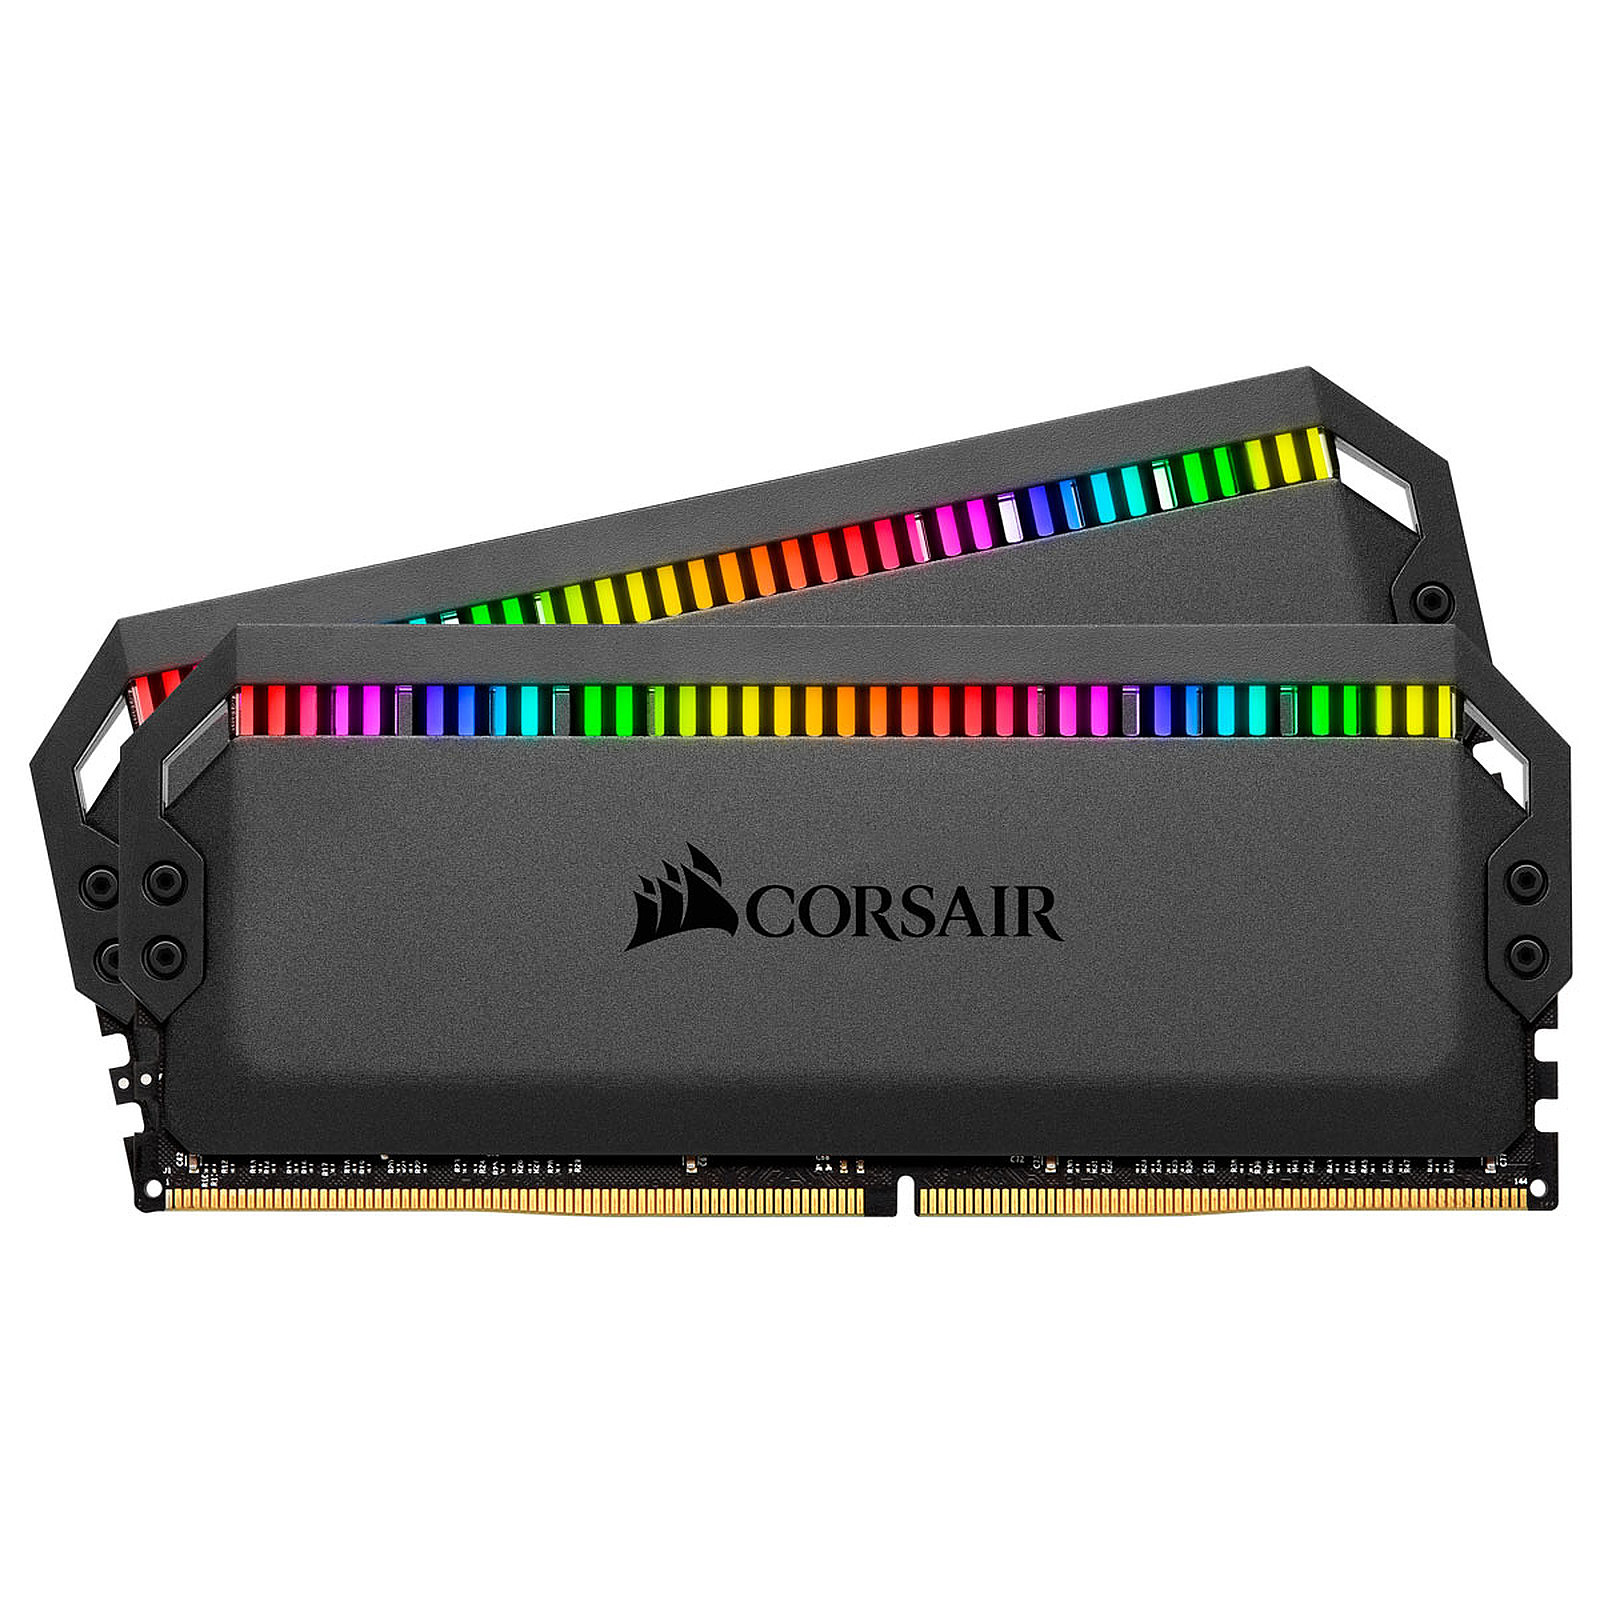 Corsair Dominator Platinum RGB 64 GB (2 x 32 GB) DDR4 3600 MHz CL18